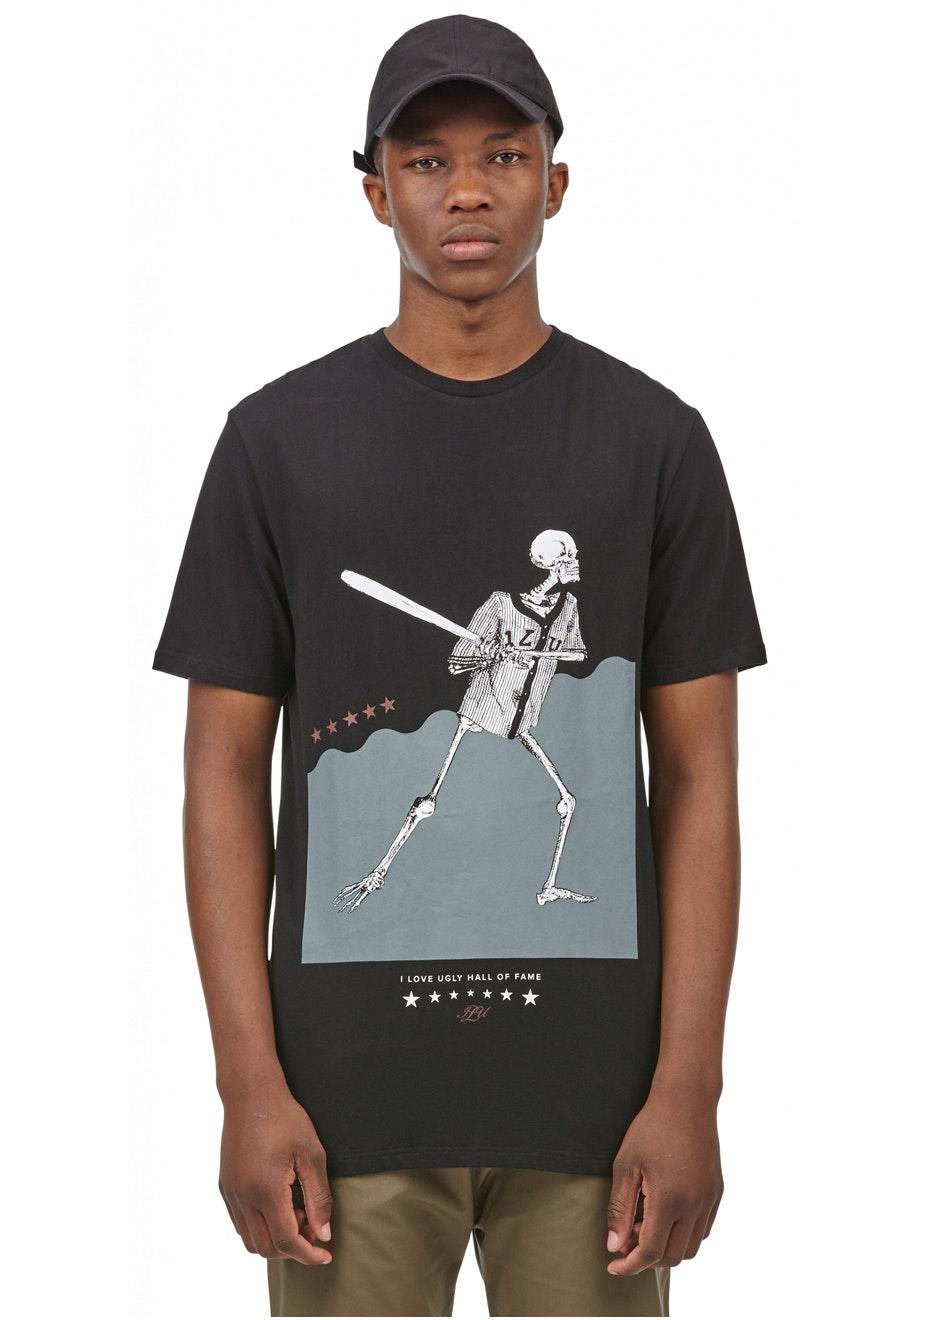 I Love Ugly - Hall Of Fame Tshirt - Black